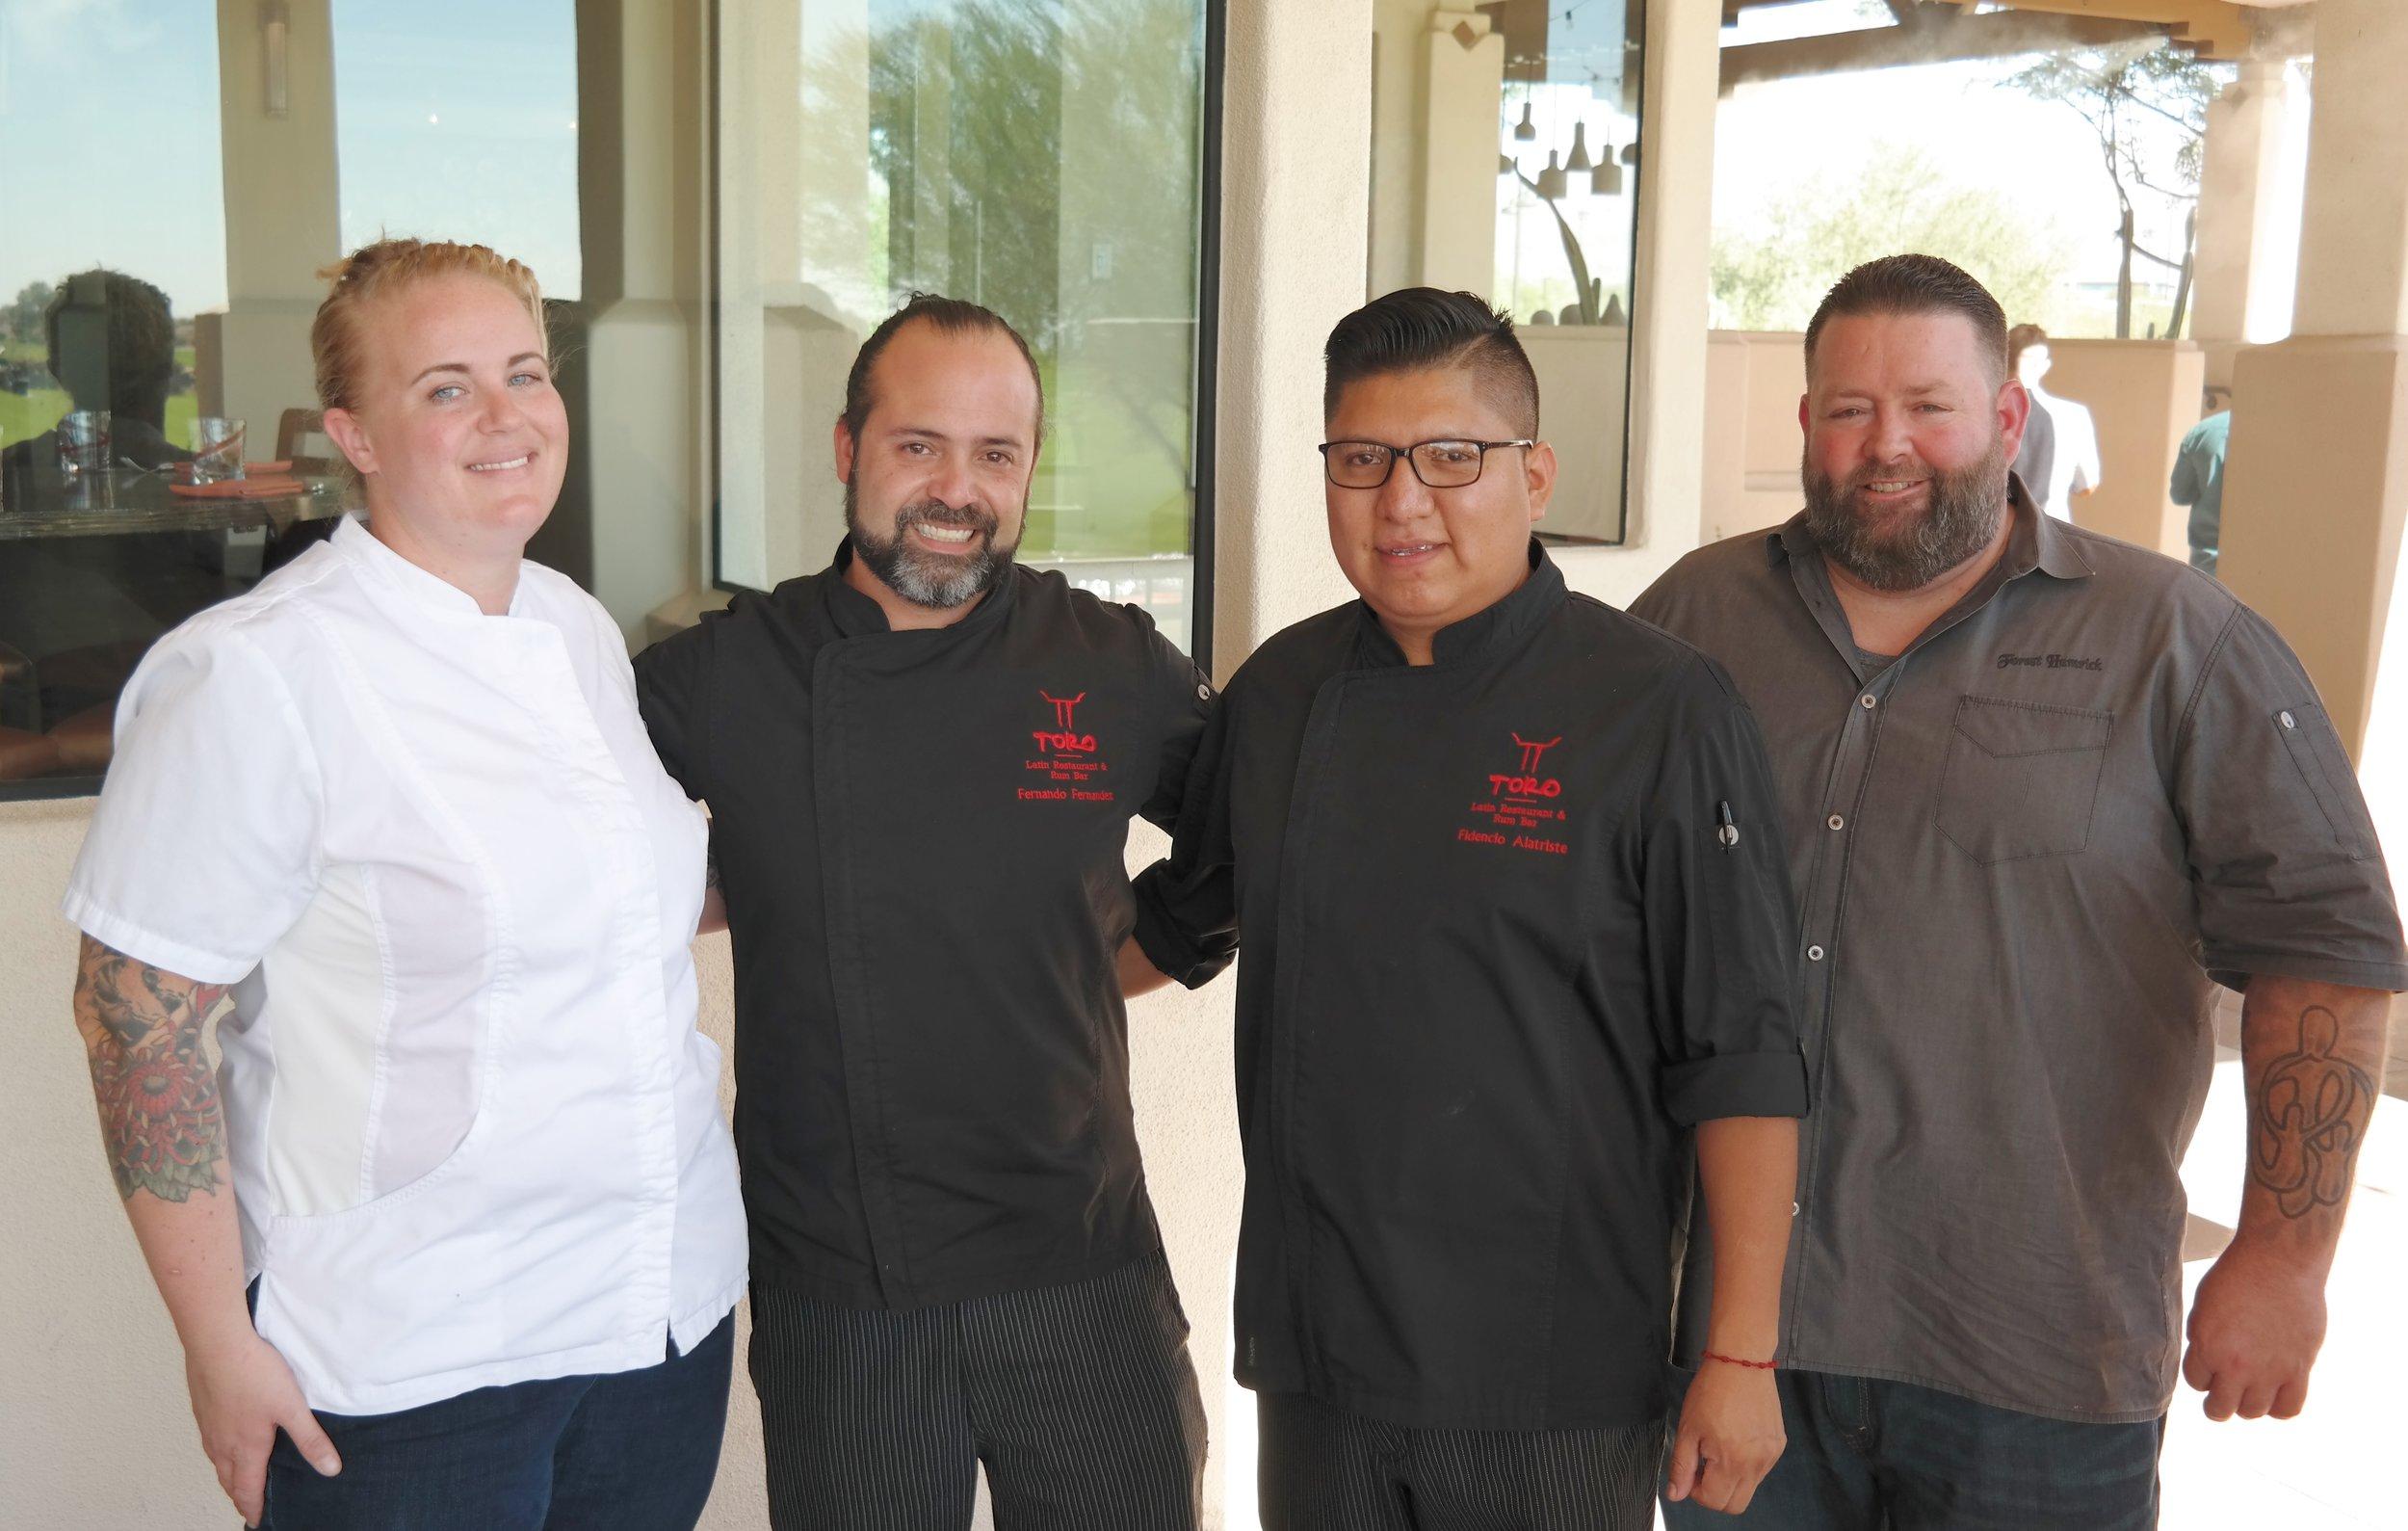 Chefs Garrant, Fernandez, Alatriste, and Hamrick